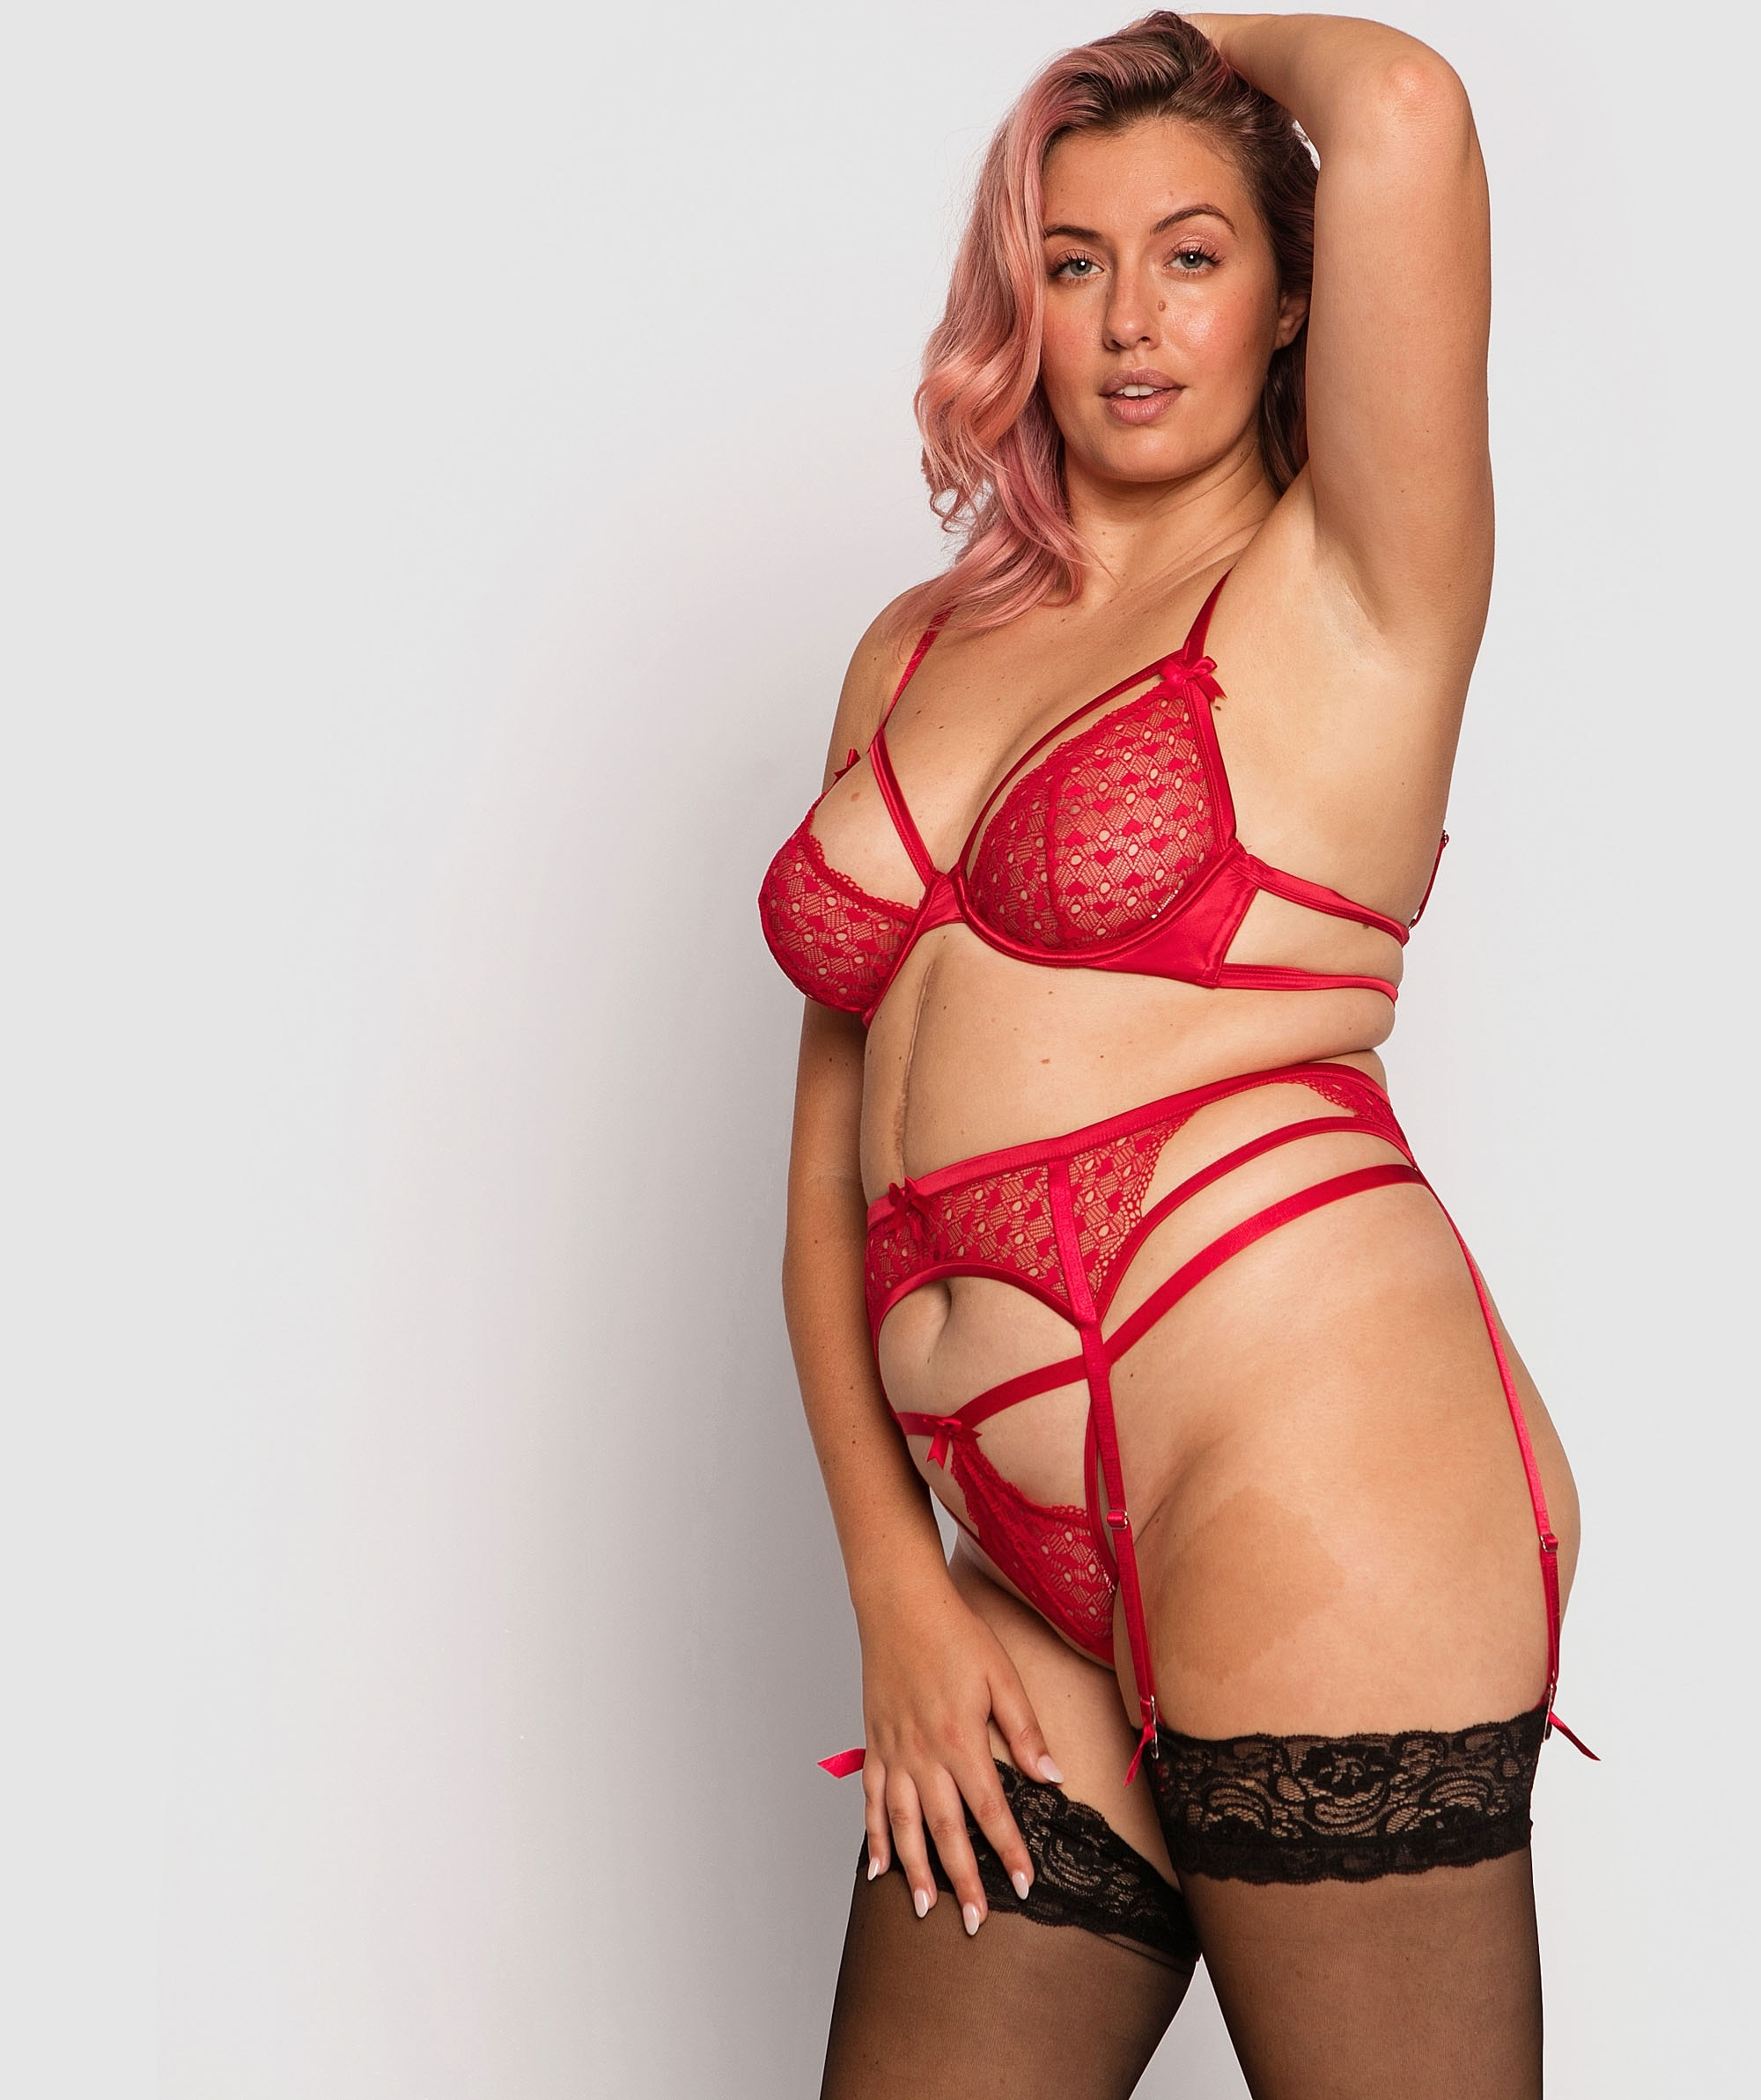 Lulu Suspender - Red